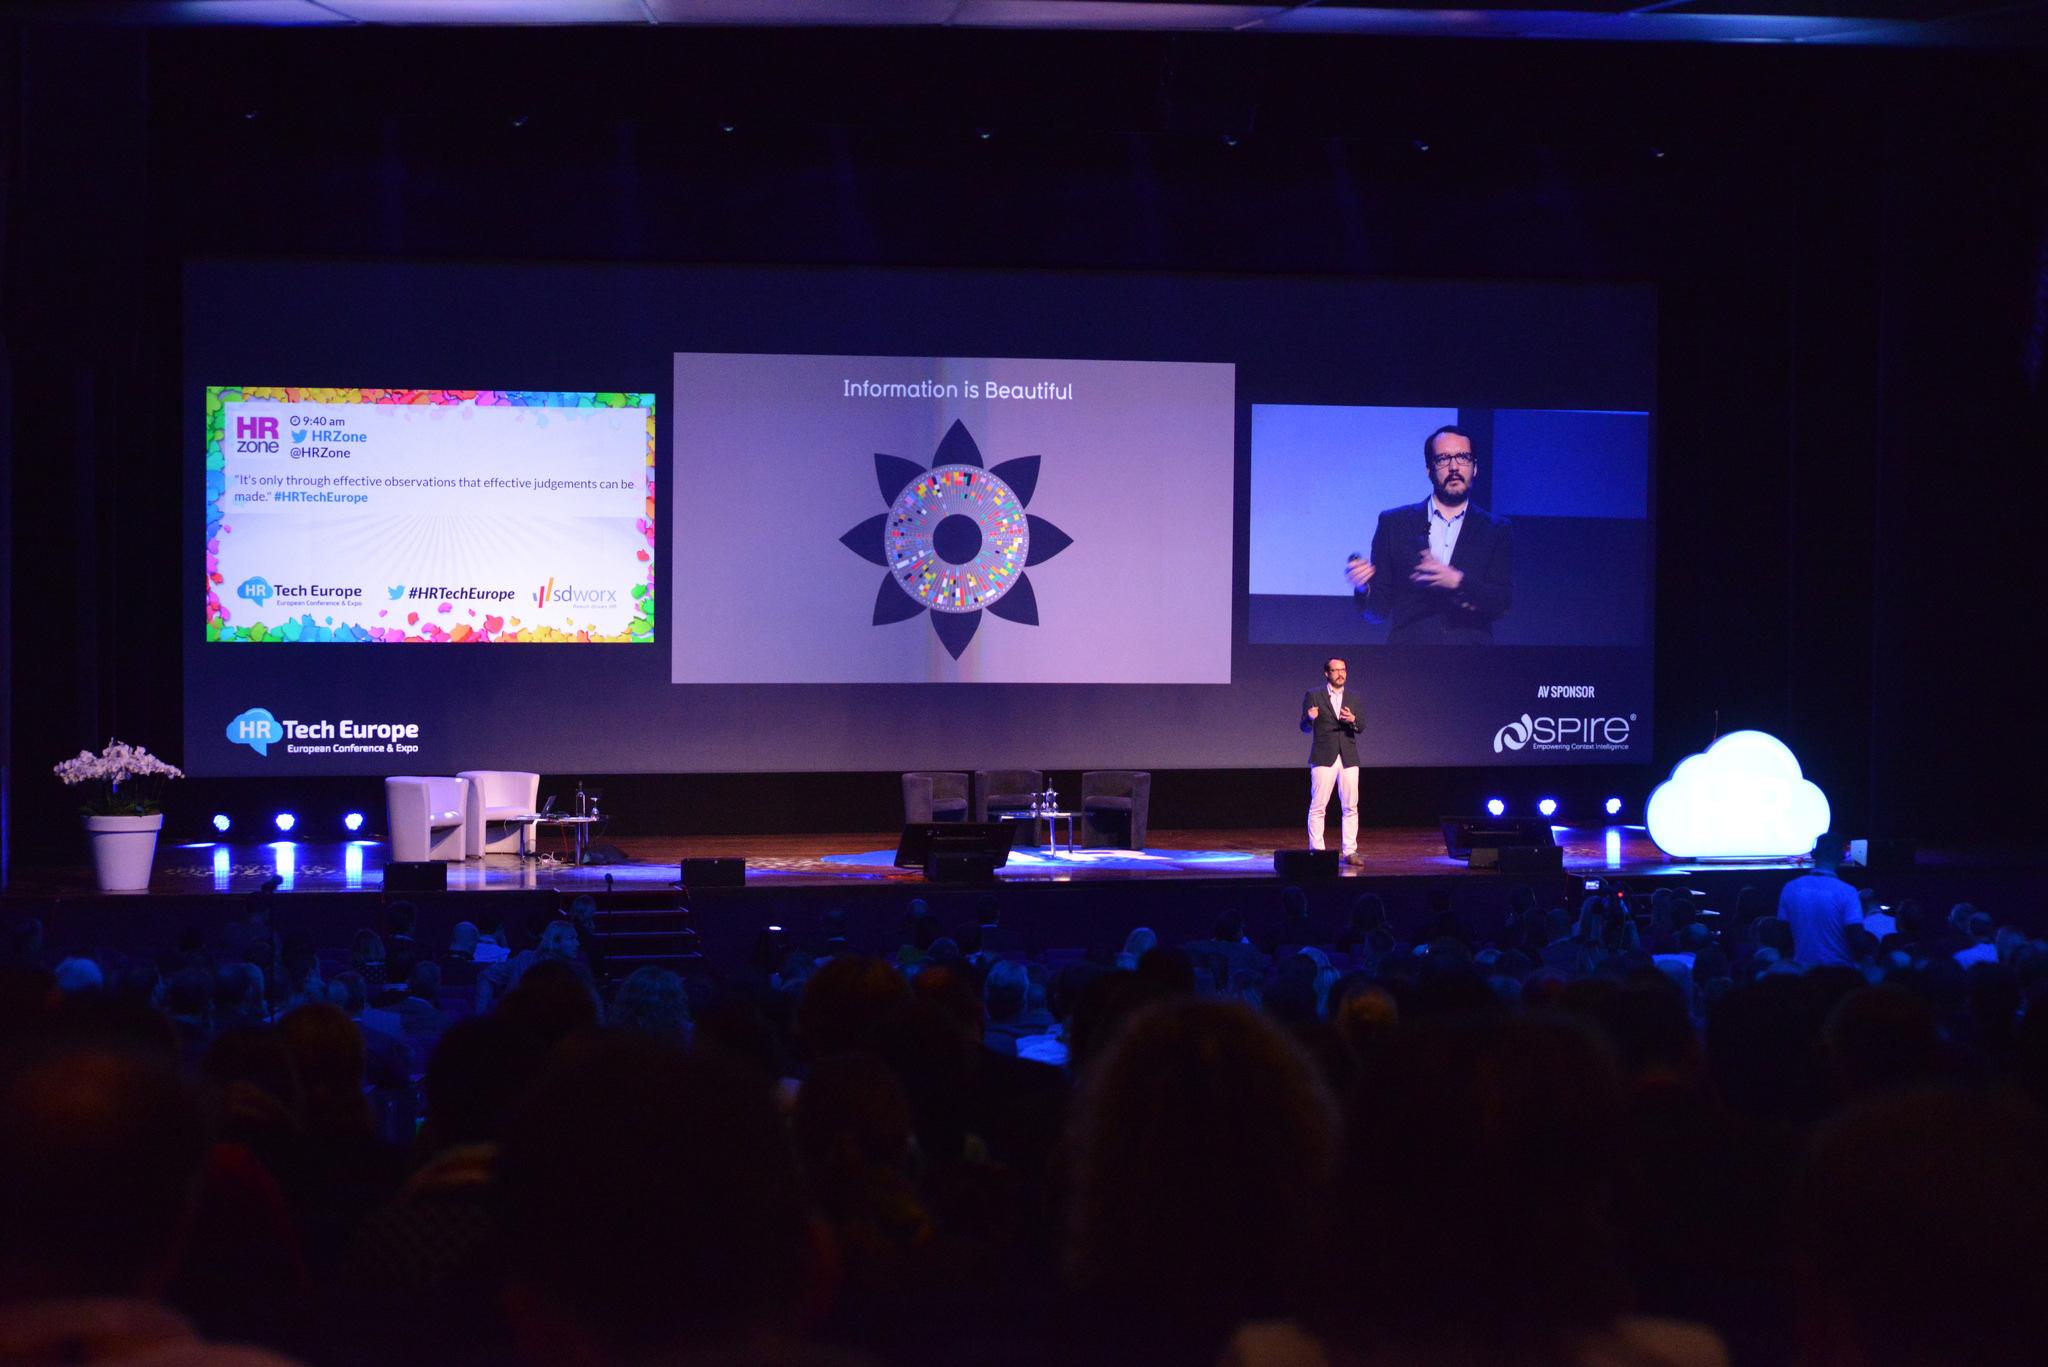 David-McCandless-Big_Data-Keynote-Presentation-@-HR-Tech-Europe-2014